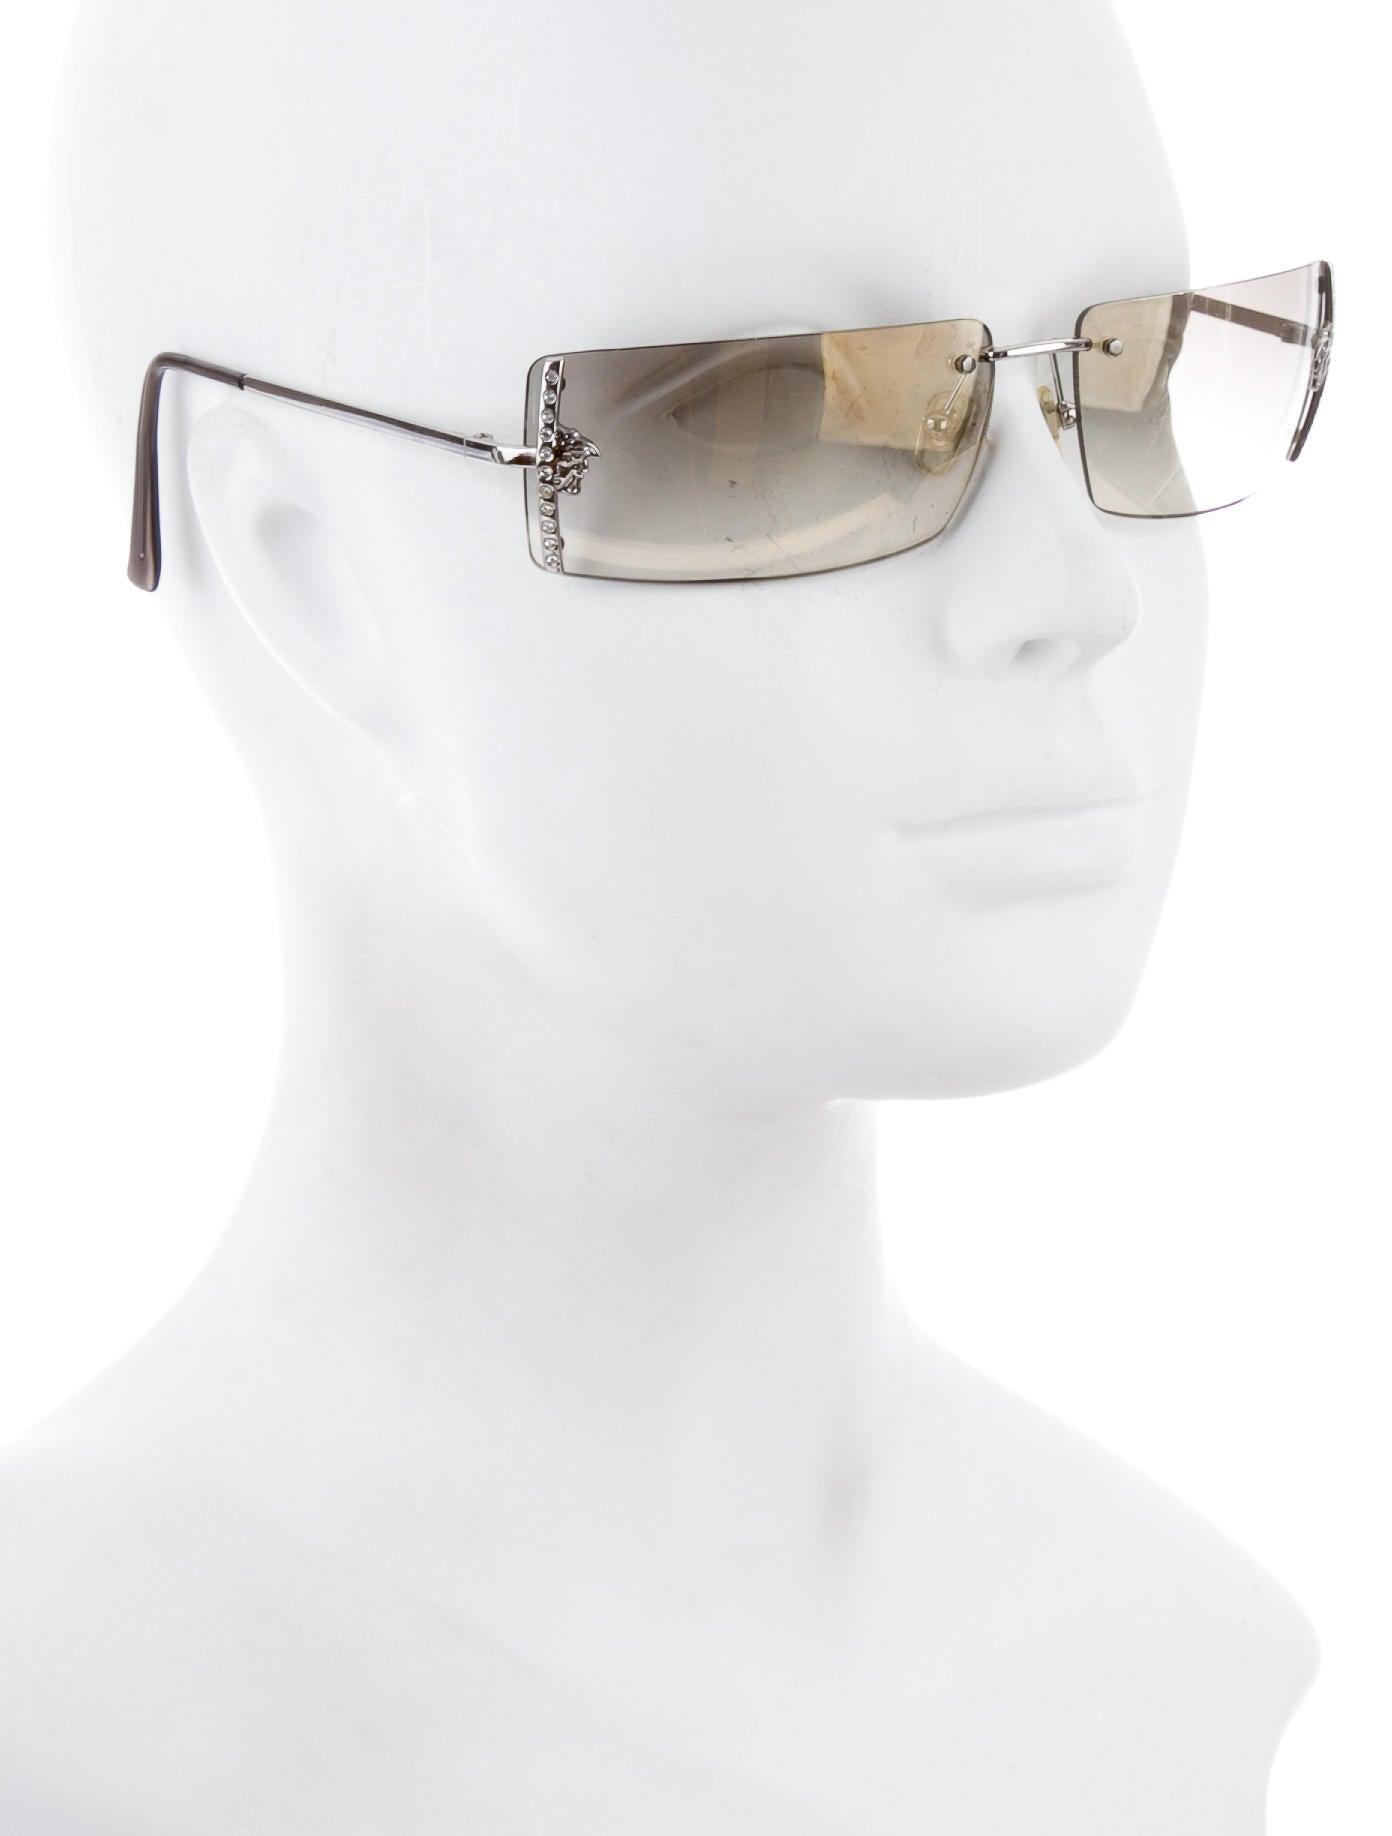 a20b1b9ec1 Versace Frameless Sunglasses Amazon